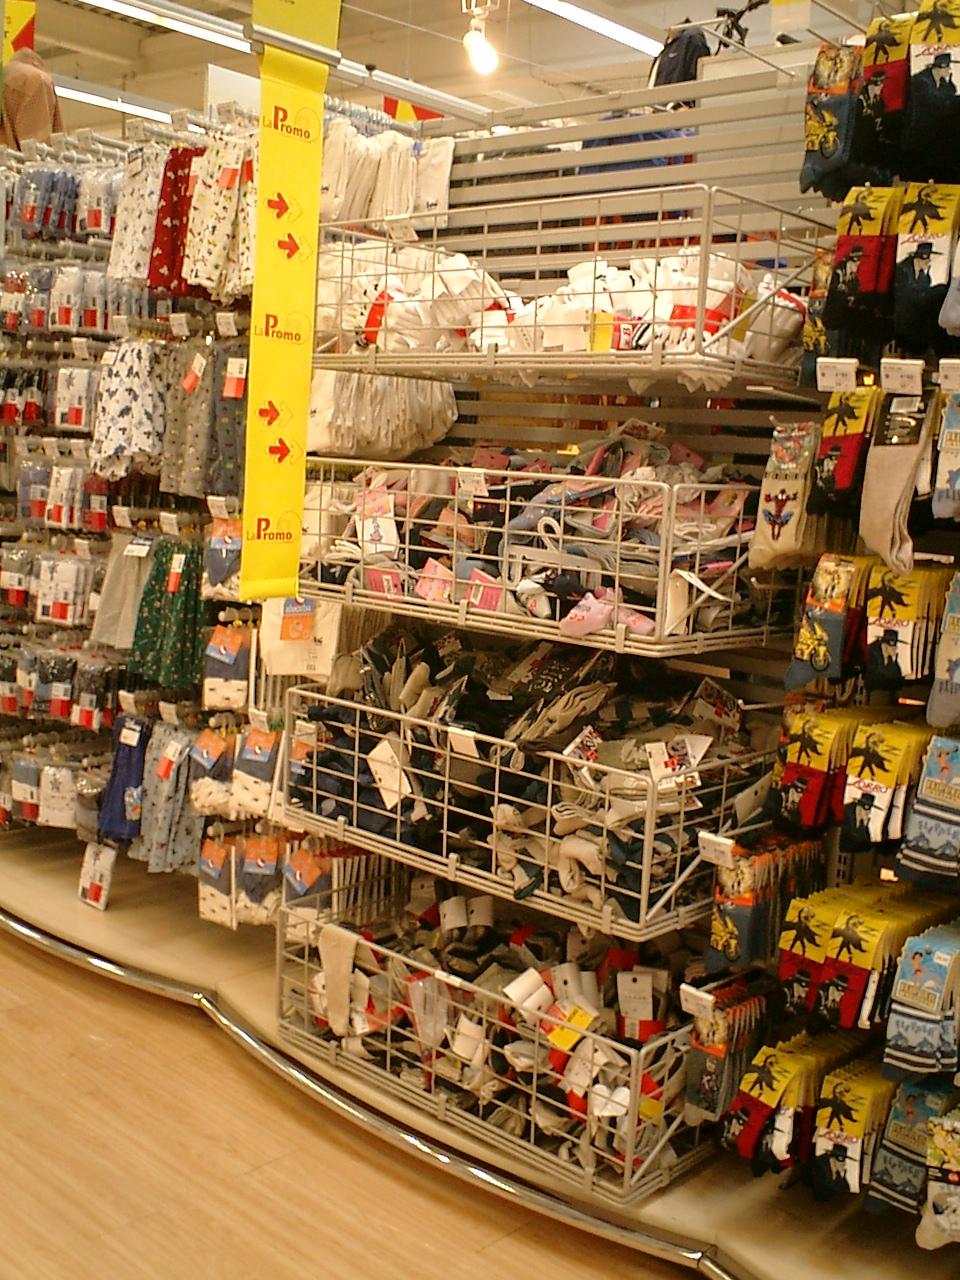 qq会员官方网_CSID:探密法国家乐福超市装修及商品陈列_联商专栏